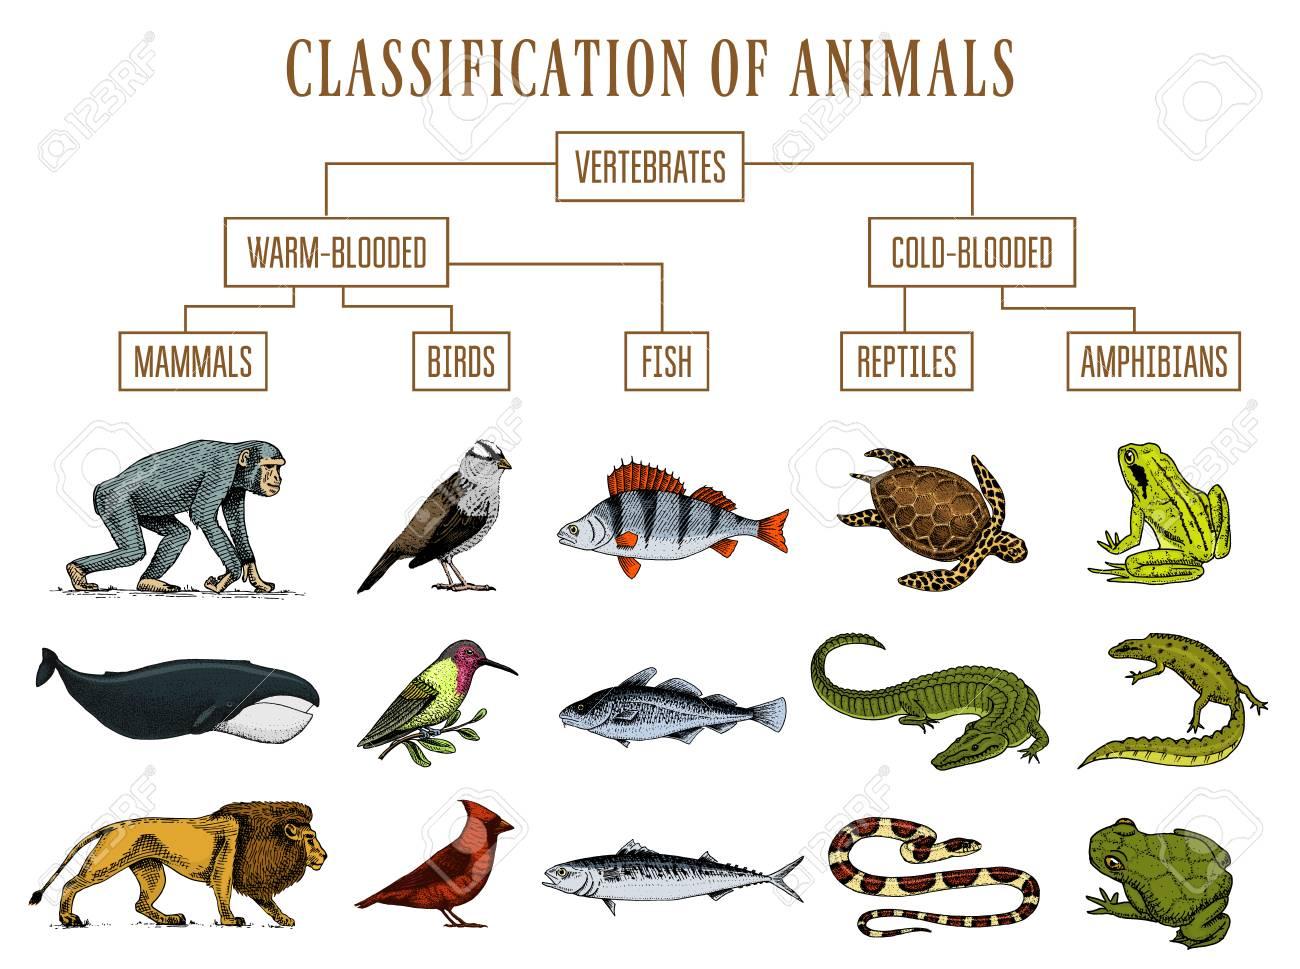 Animal Kingdom Quiz No.4